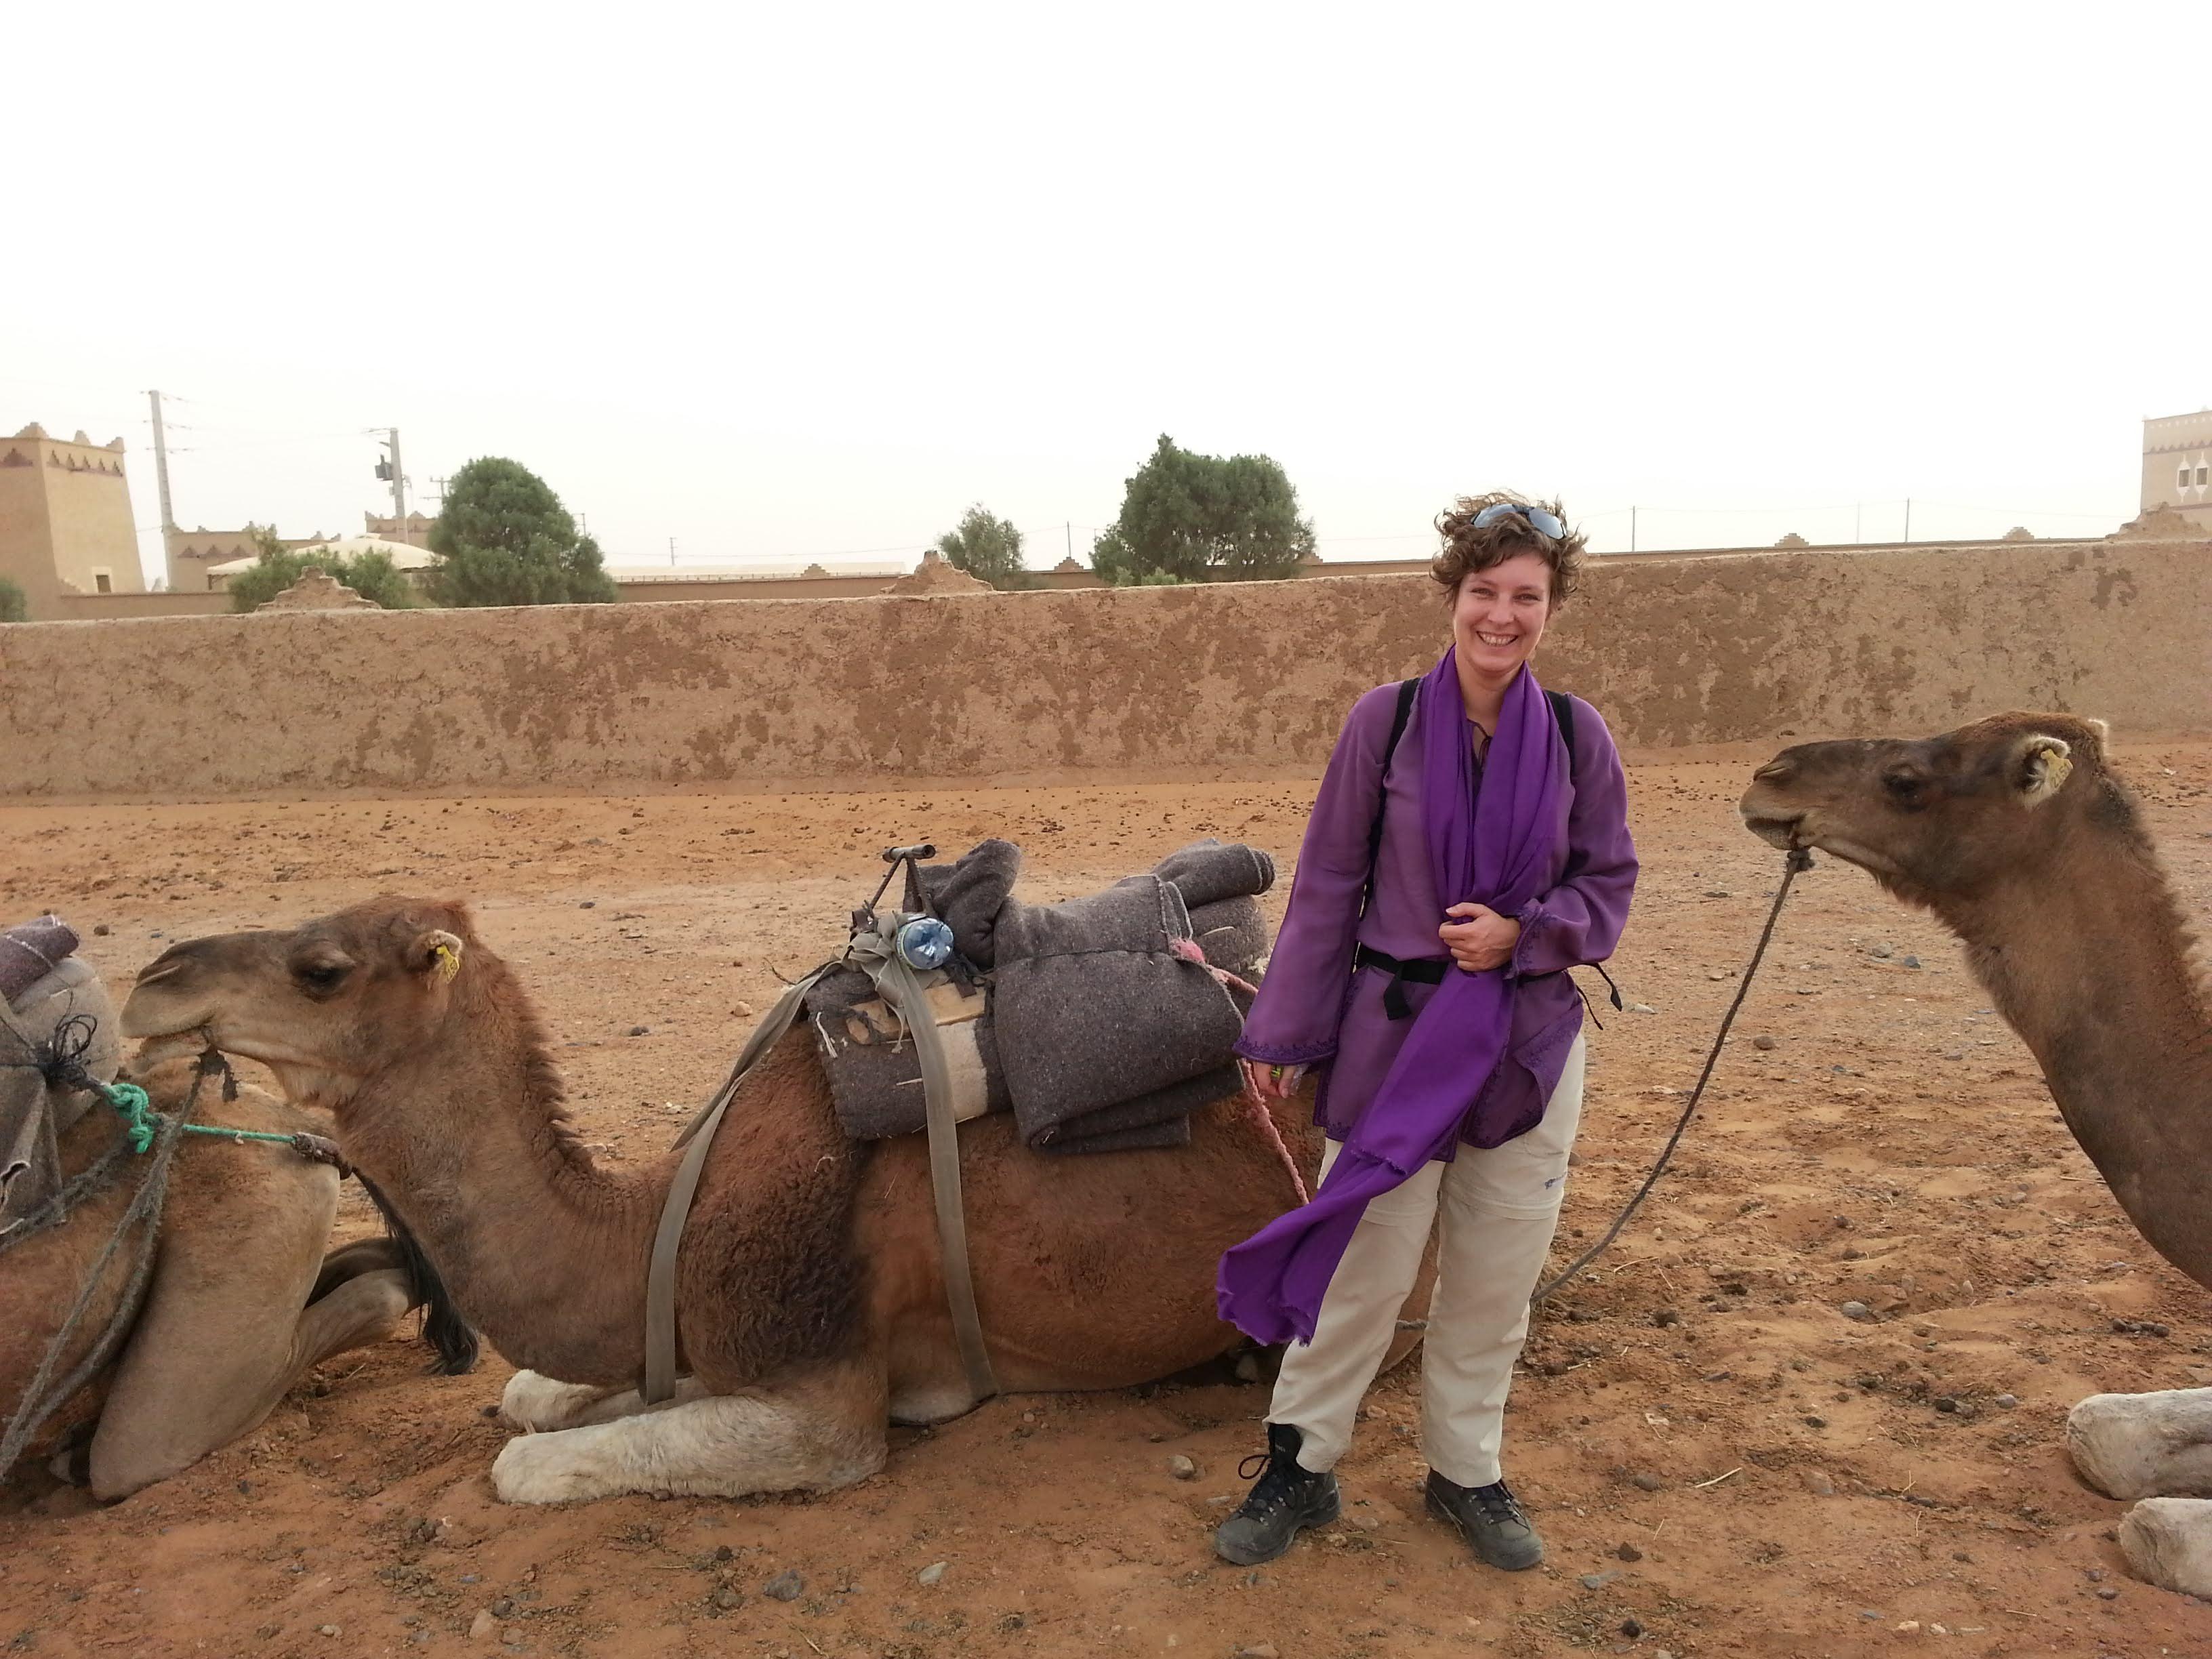 bezinningsreis woestijn-retraîte Sahara